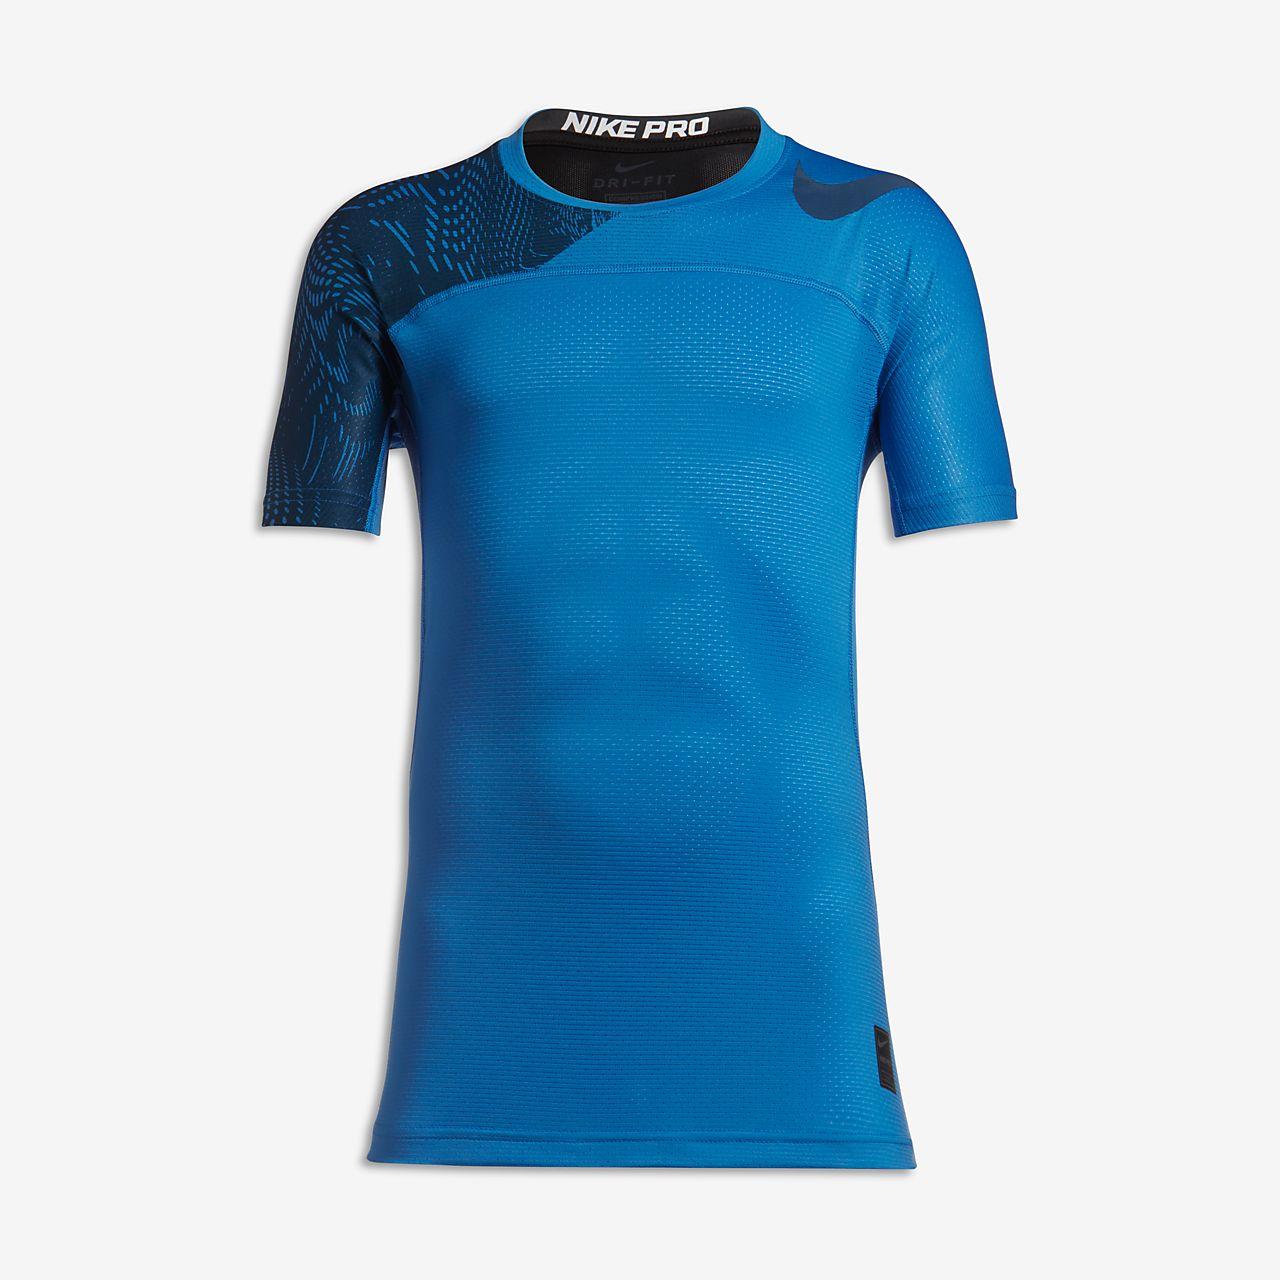 Nike Pro HyperCool Big Kids' Short Sleeve Training Tops Light Photo Blue/Industrial Blue